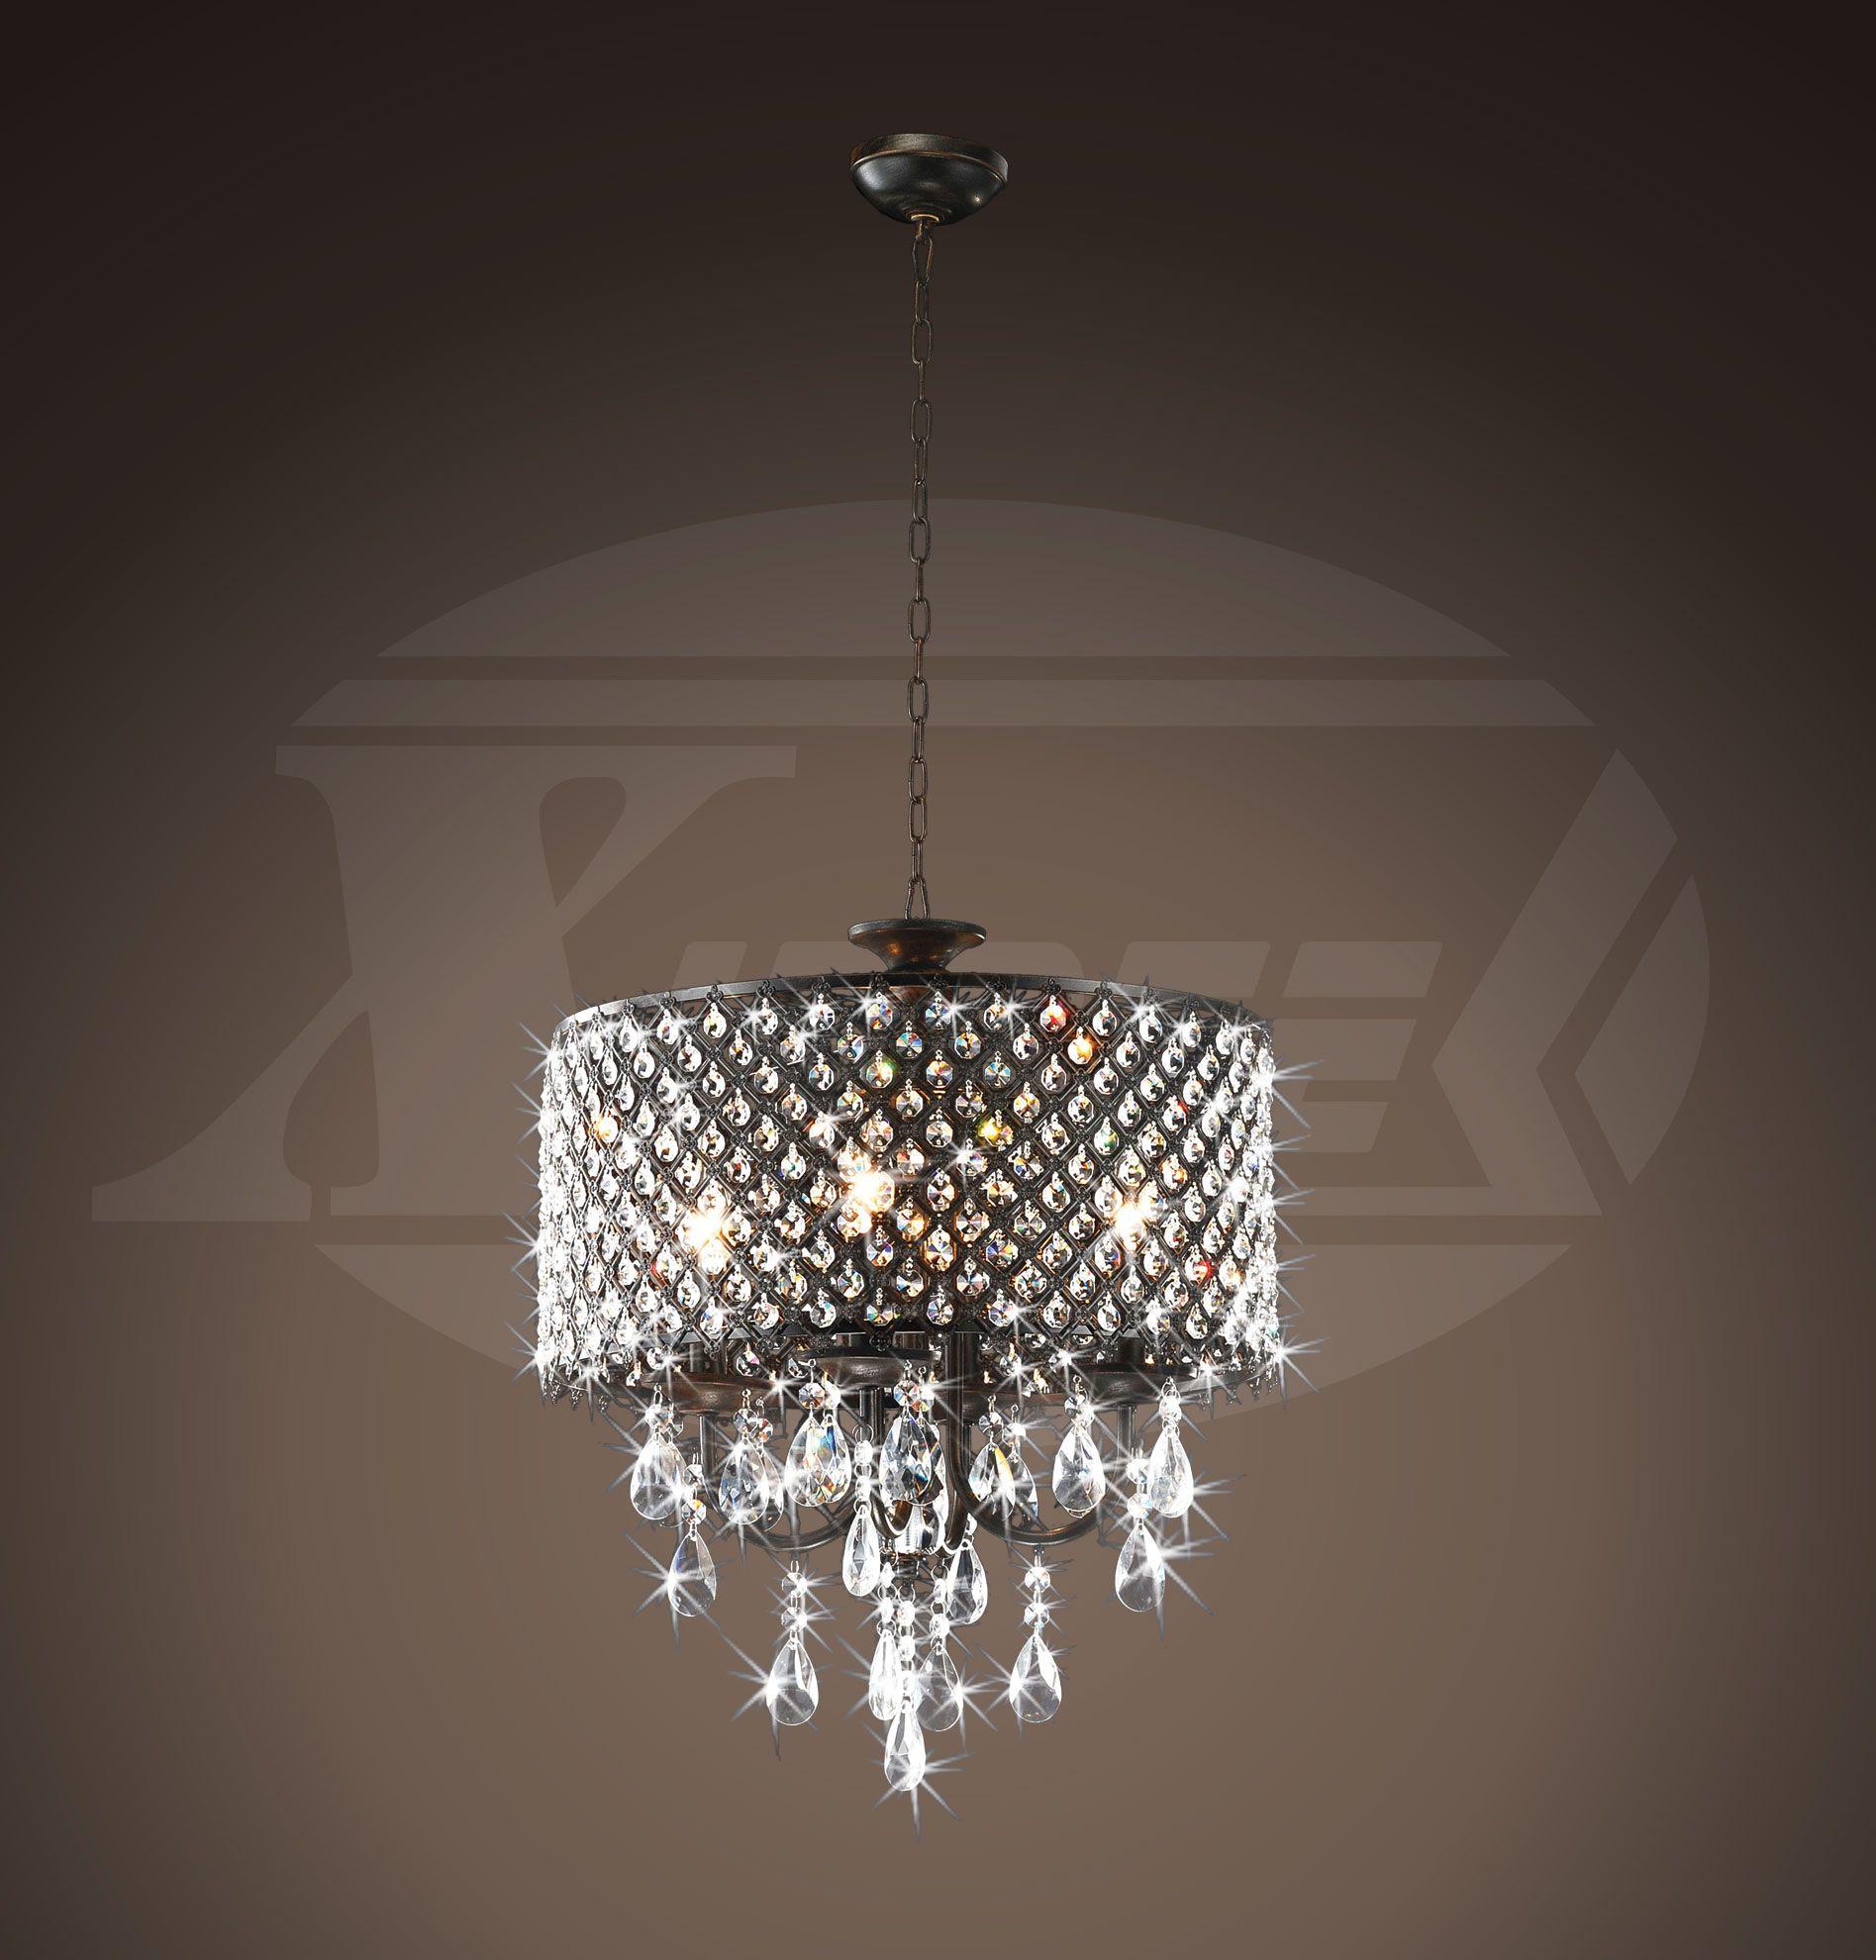 Xiertekusa Com Index Php Rachelle Round 4 Light Antique Bronze Brass Crystal Chandelier Pendant 17 Wx21 H Xtk Bpe 55bkx Html